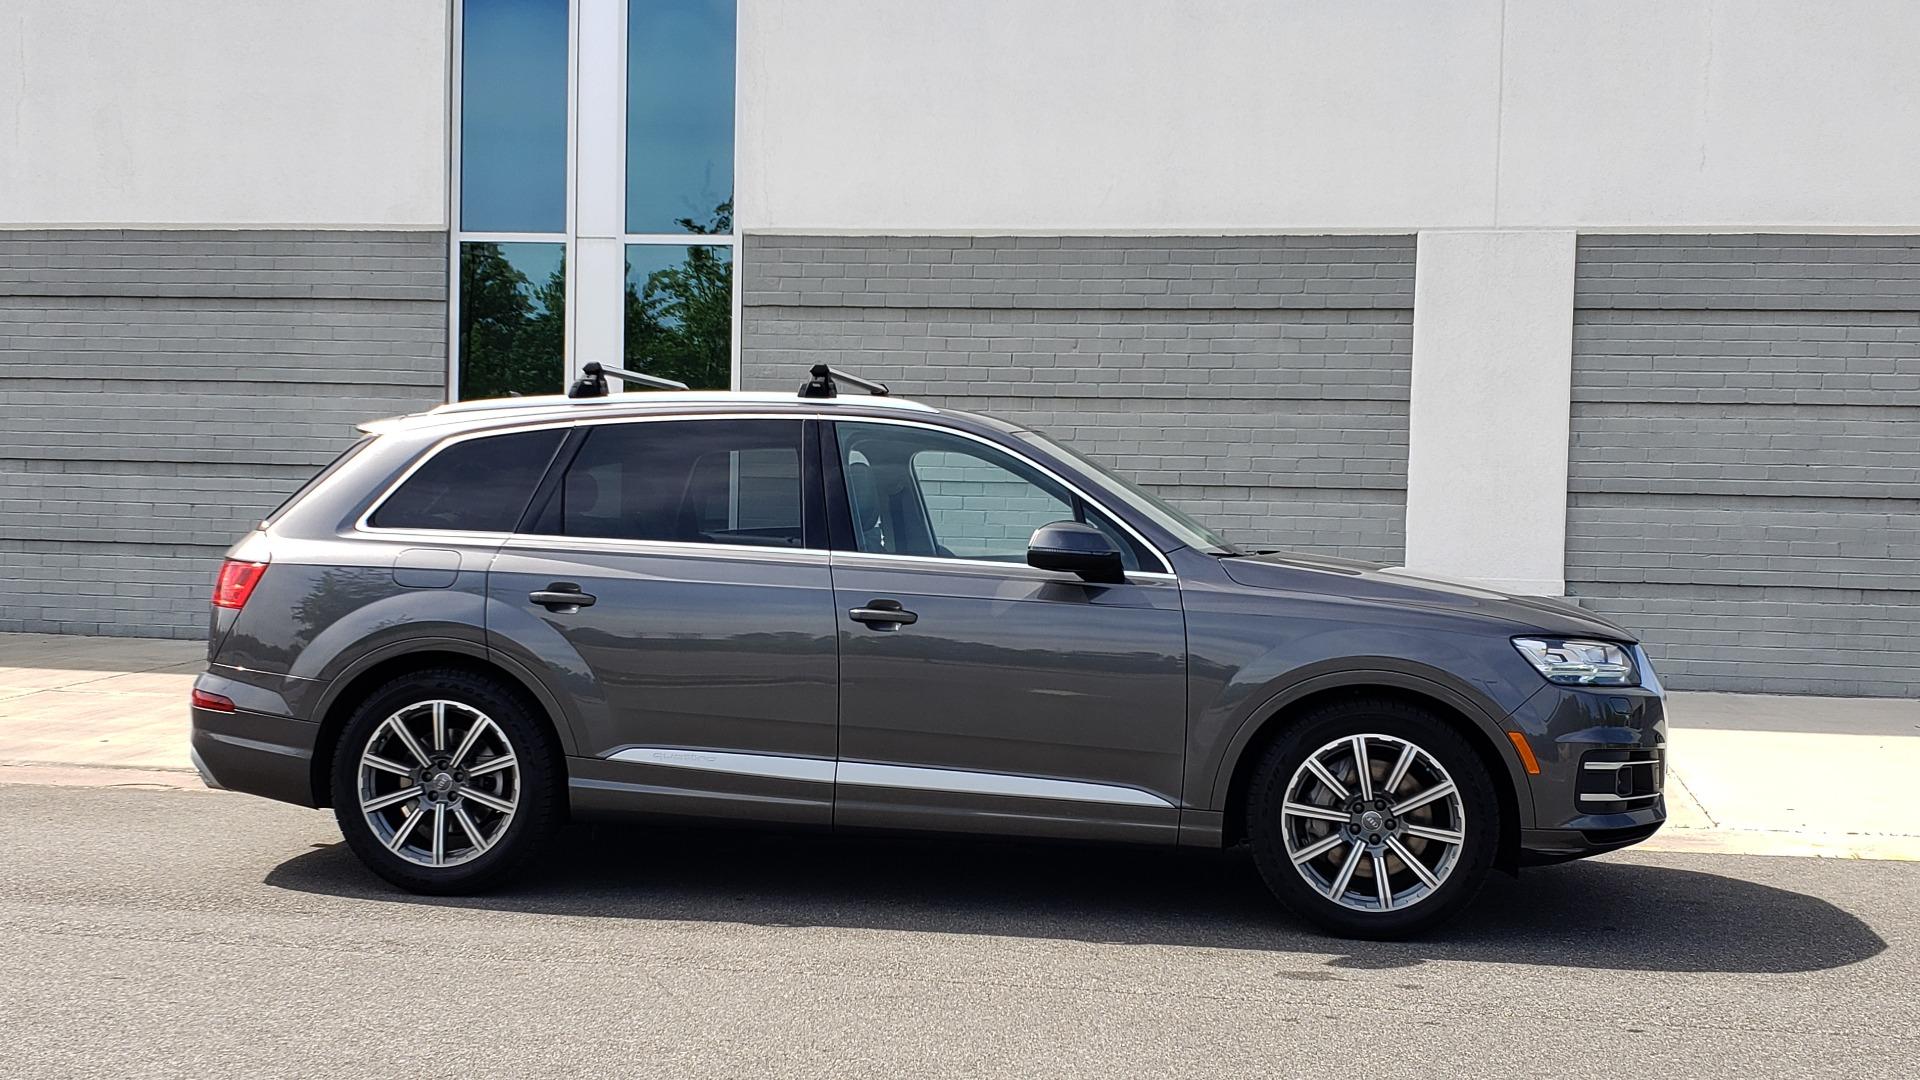 Used 2018 Audi Q7 PRESTIGE TIPTRONIC / NAV / SUNROOF / ADAPTIVE PKG / DRVR ASST / CLD WTHR /  for sale $49,995 at Formula Imports in Charlotte NC 28227 10